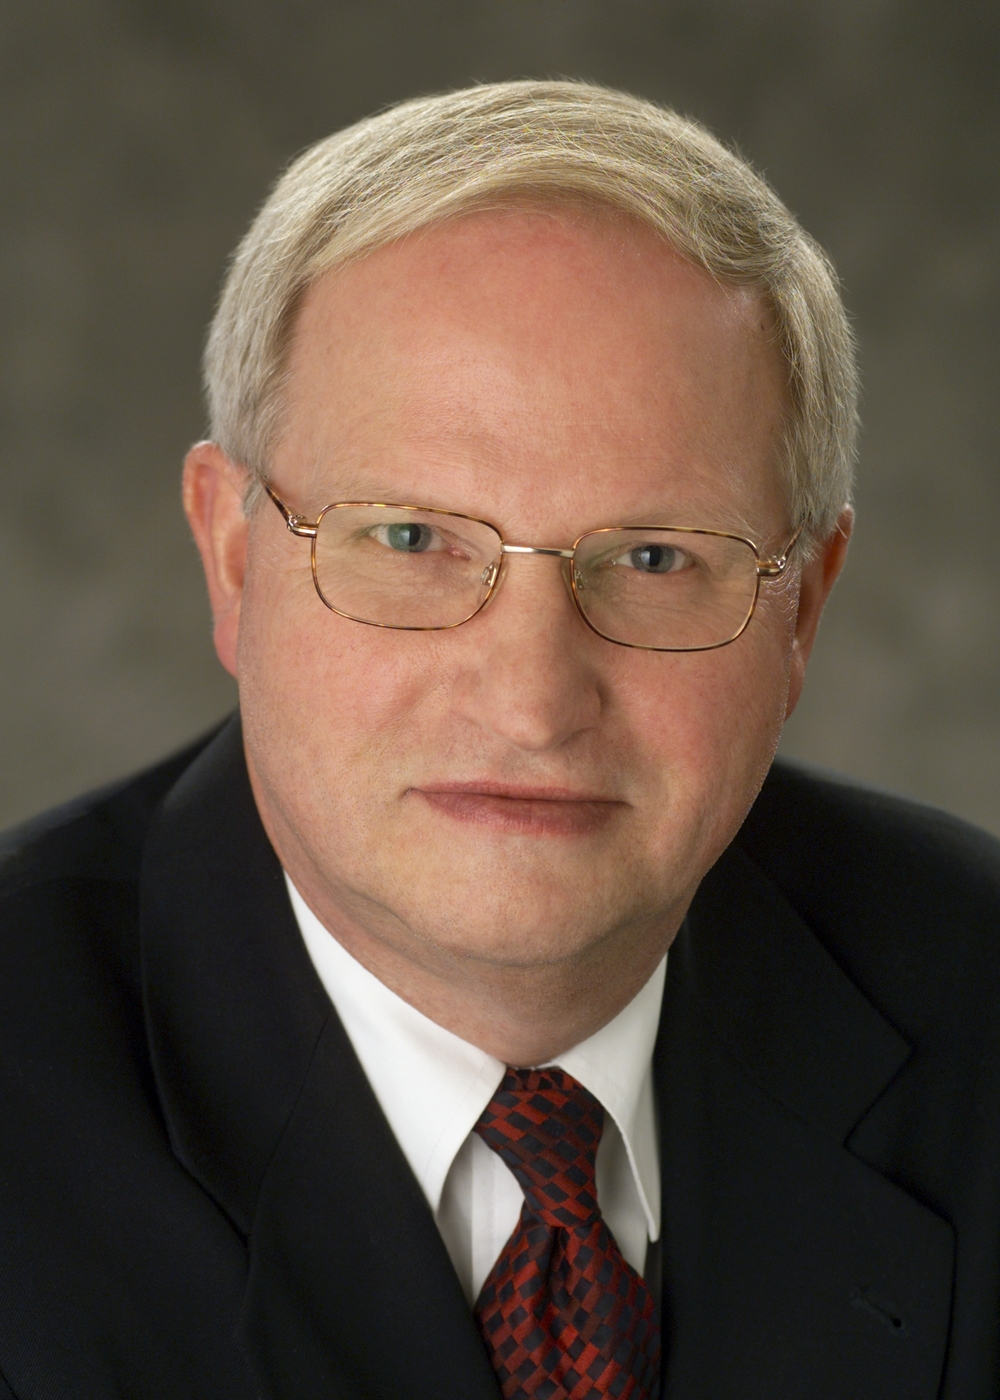 Dirk Ryneveld, Q.C.